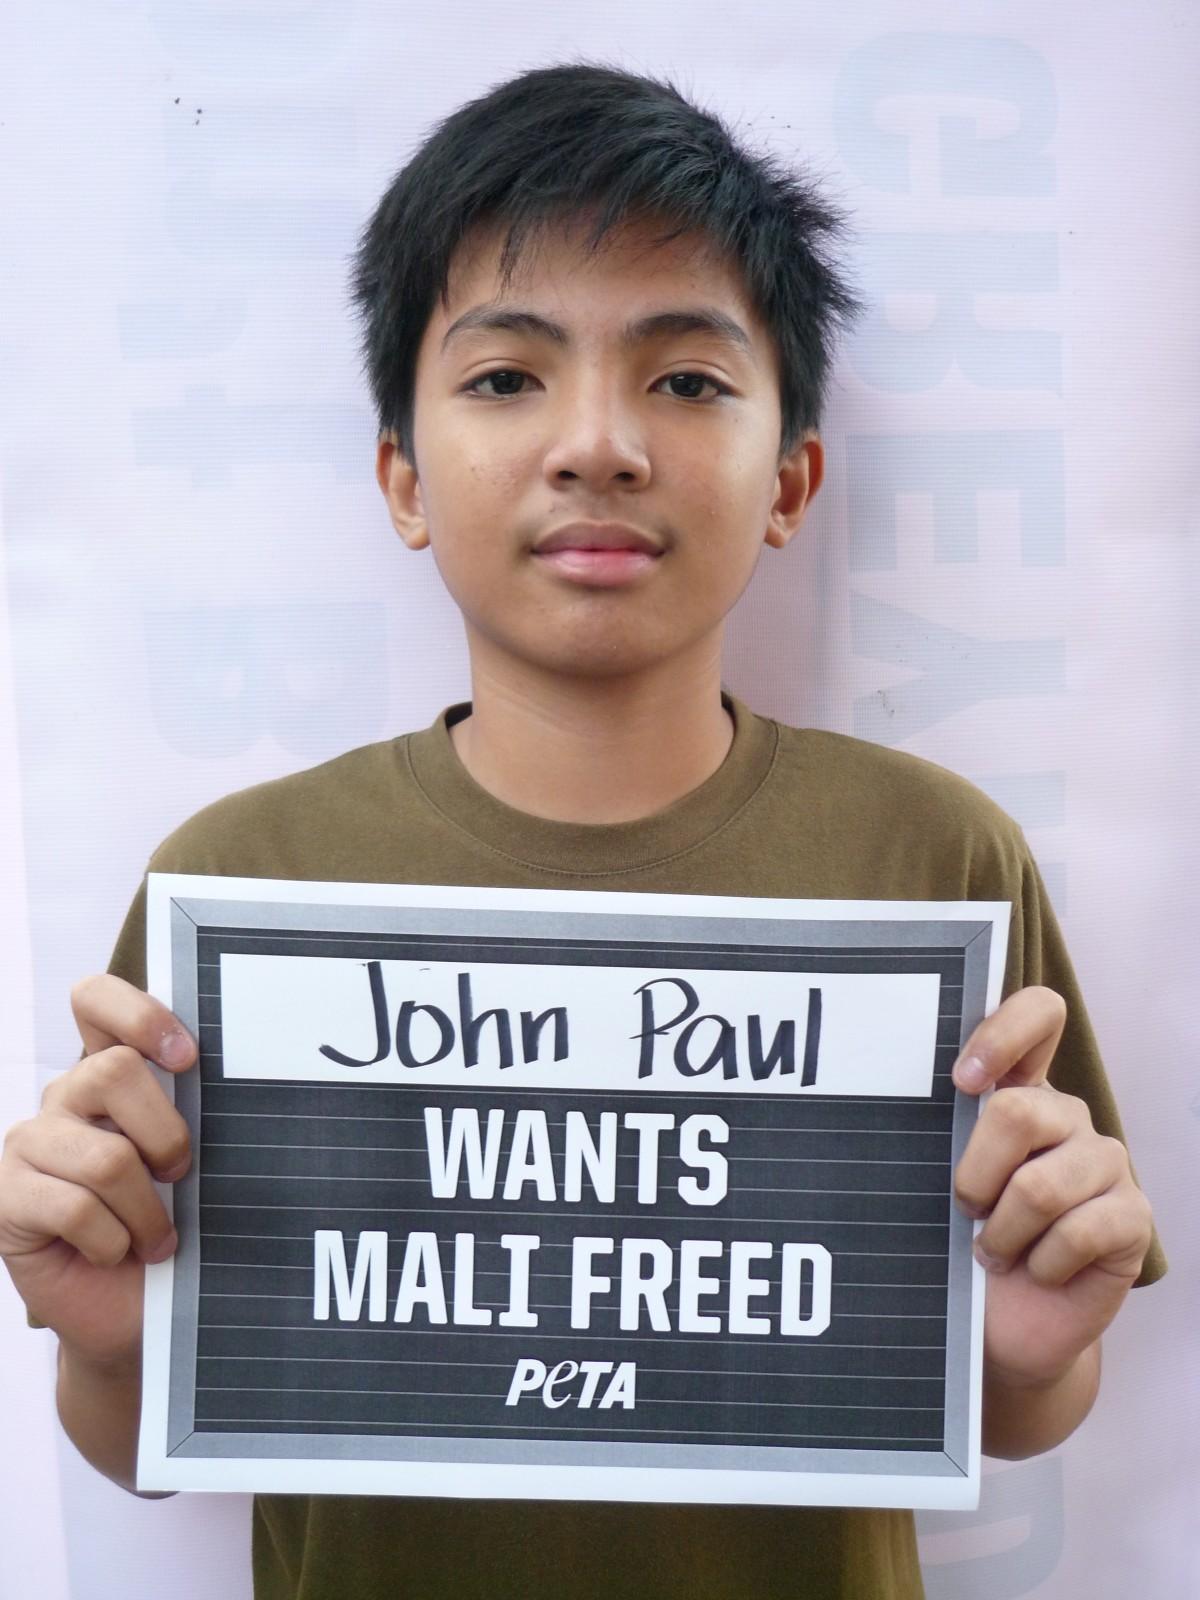 Get 'Mugged': Help Free Mali From a Life Sentence